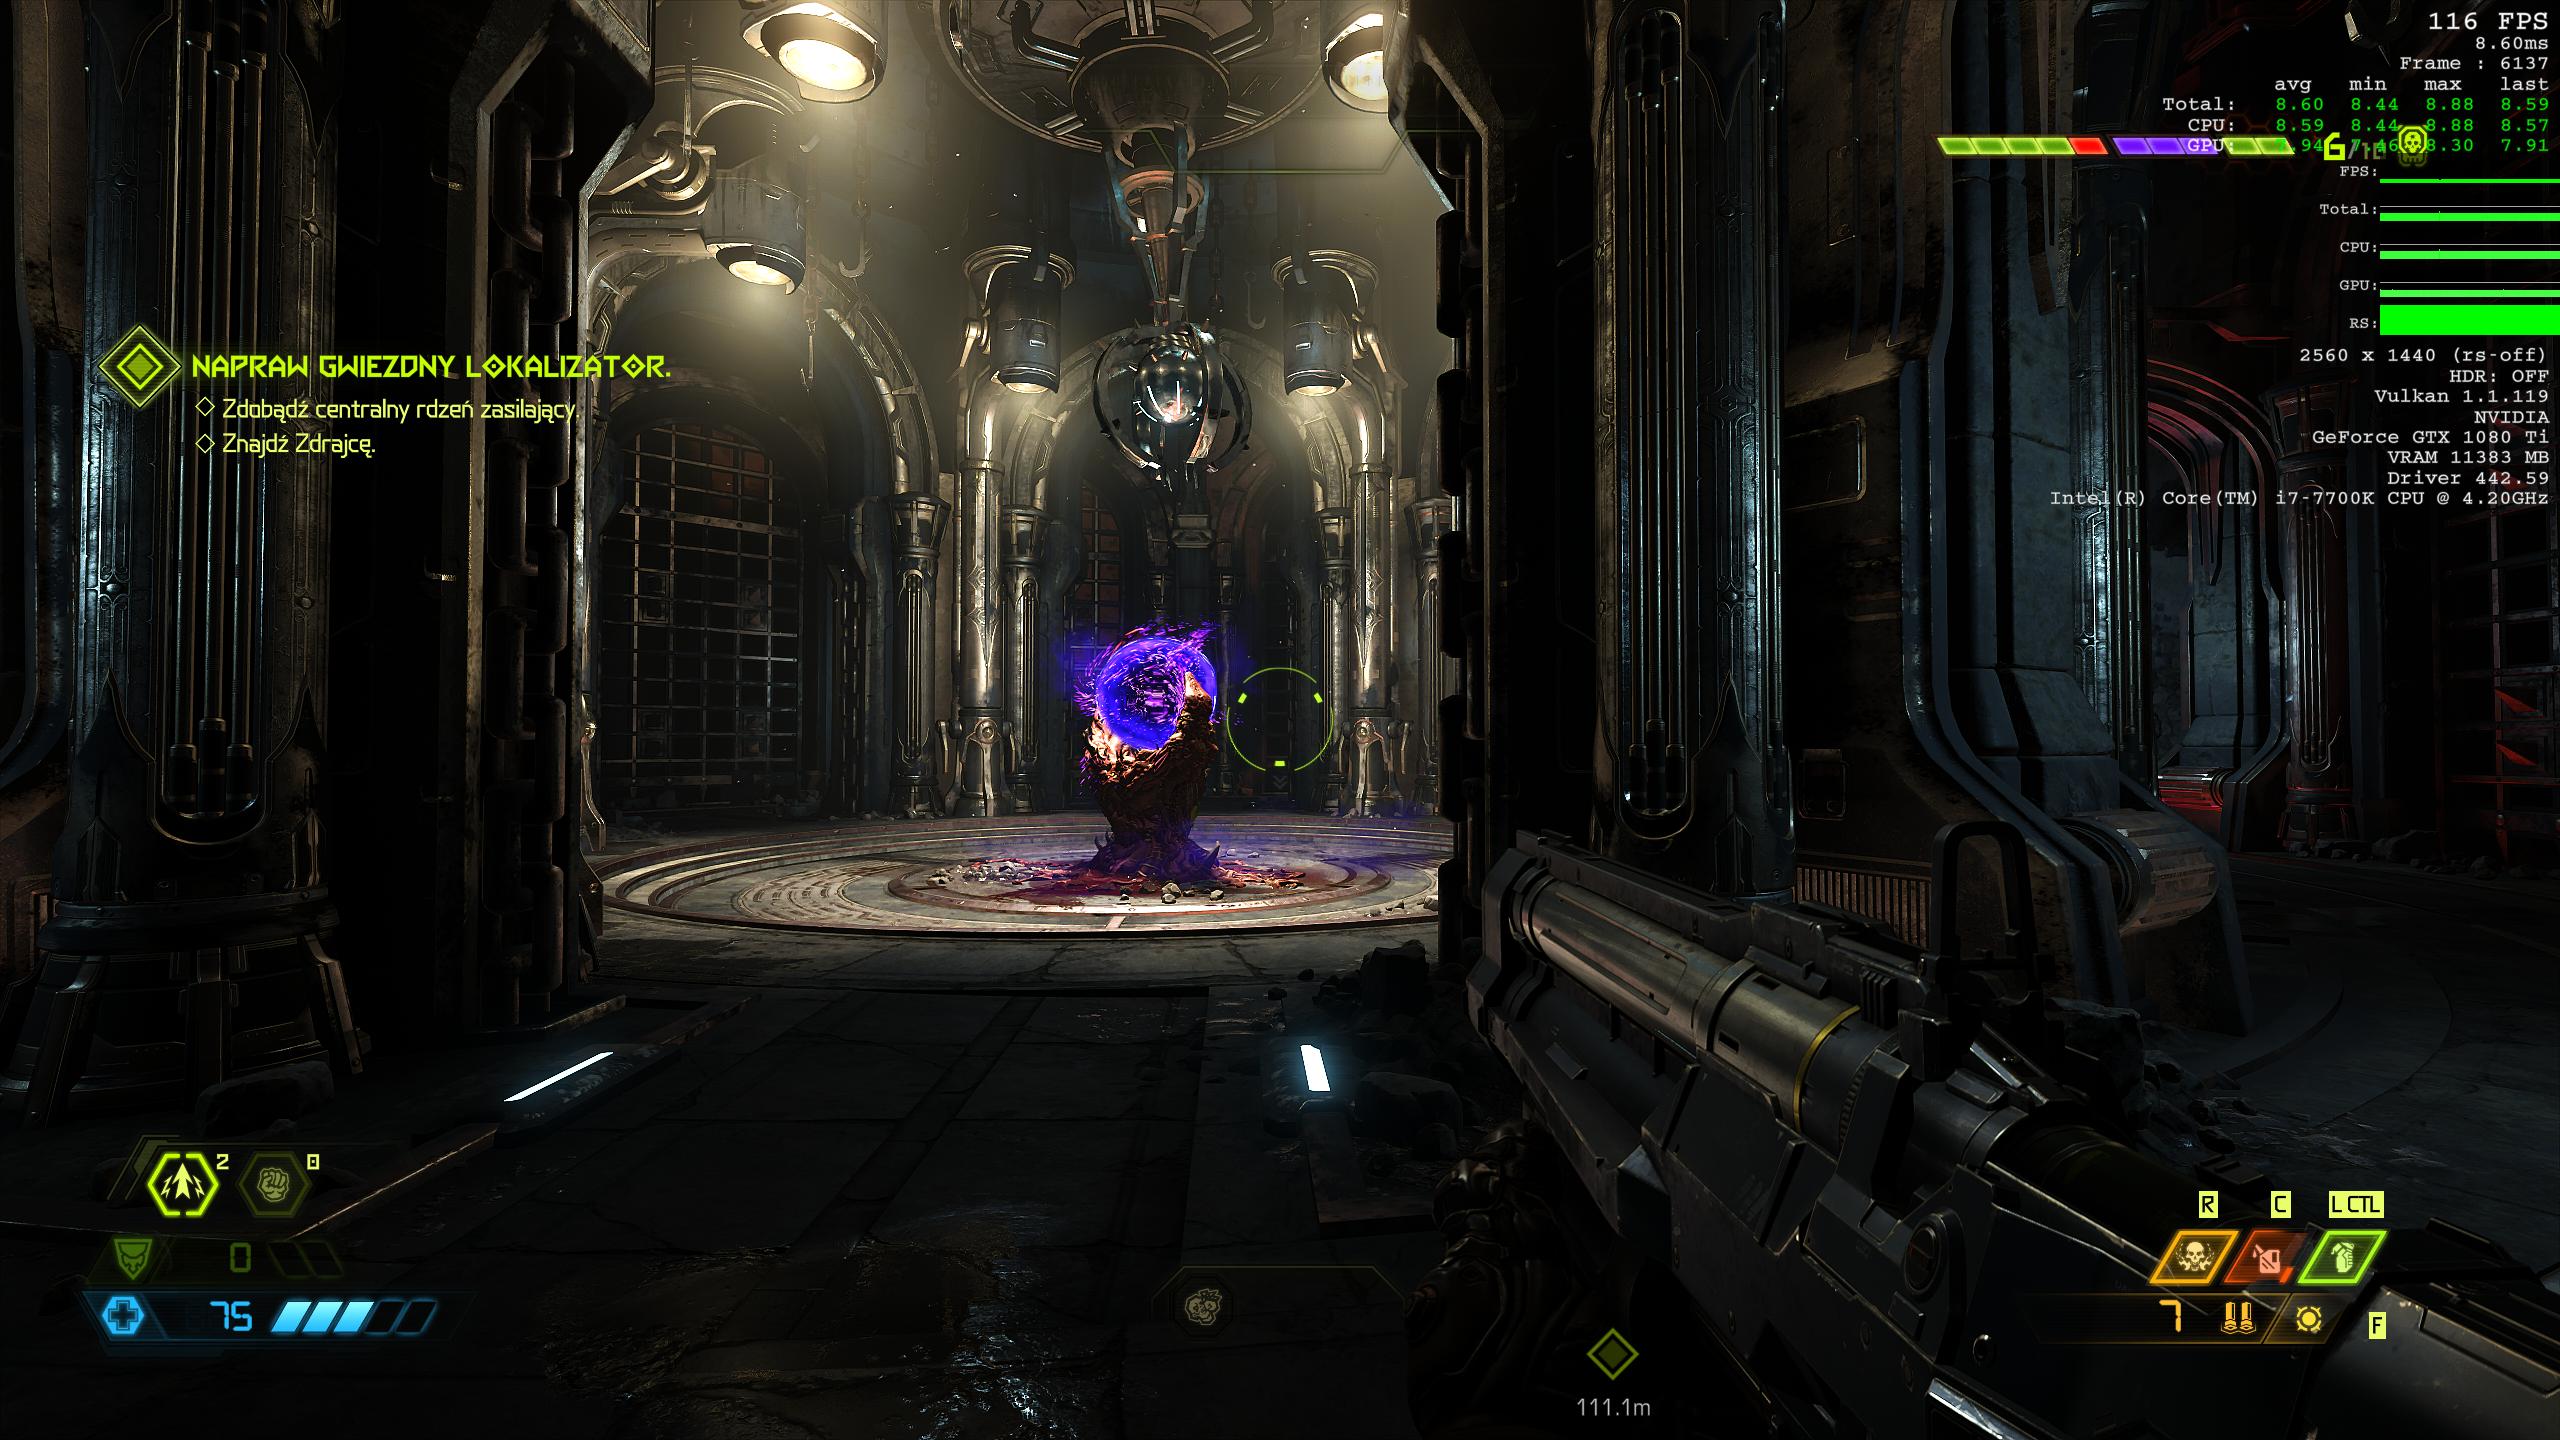 Doom-Eternal-Screenshot-2020-03-22-20-07-01-50.png